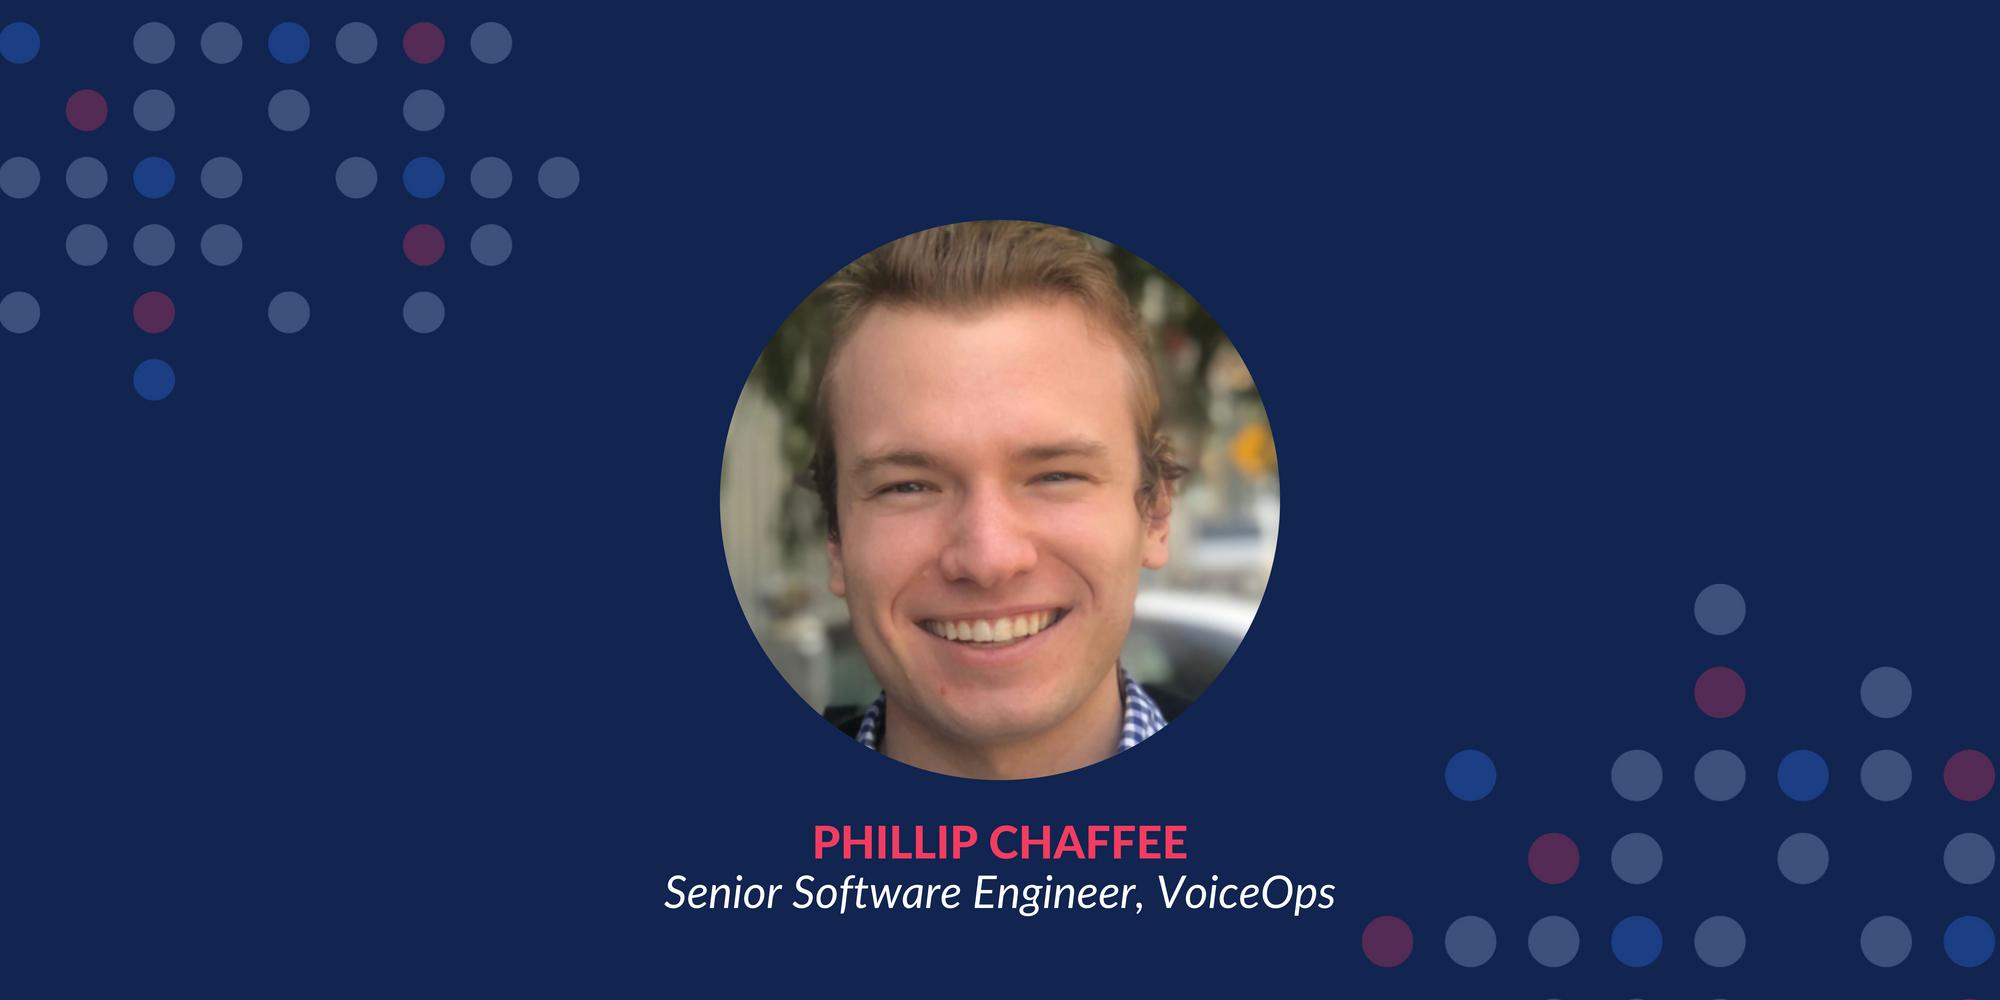 Phillip Chaffee, Senior Software Engineer